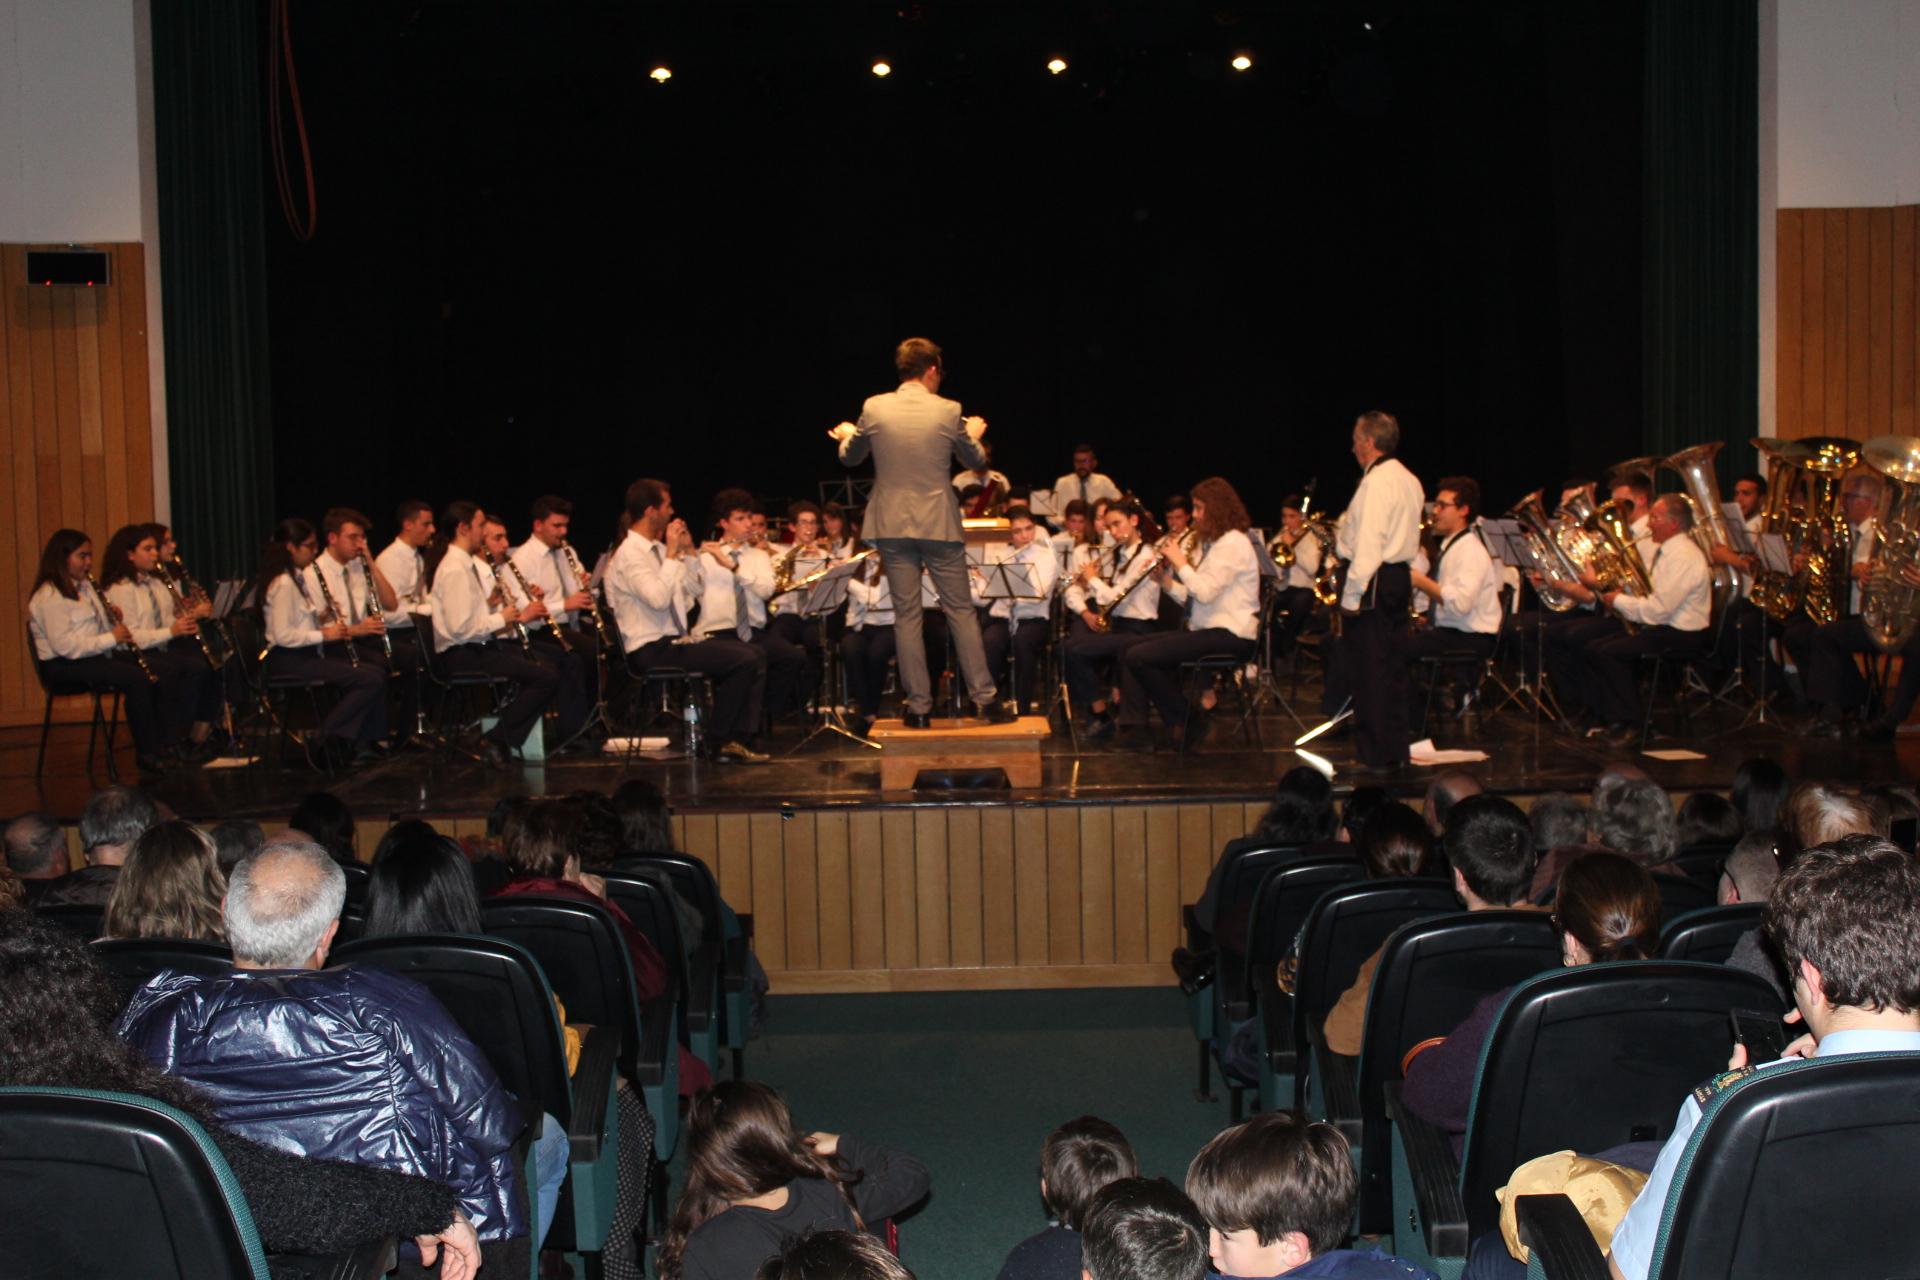 Concerto de bandas filarmónicas do concelho de Macedo encheu o Centro Cultural